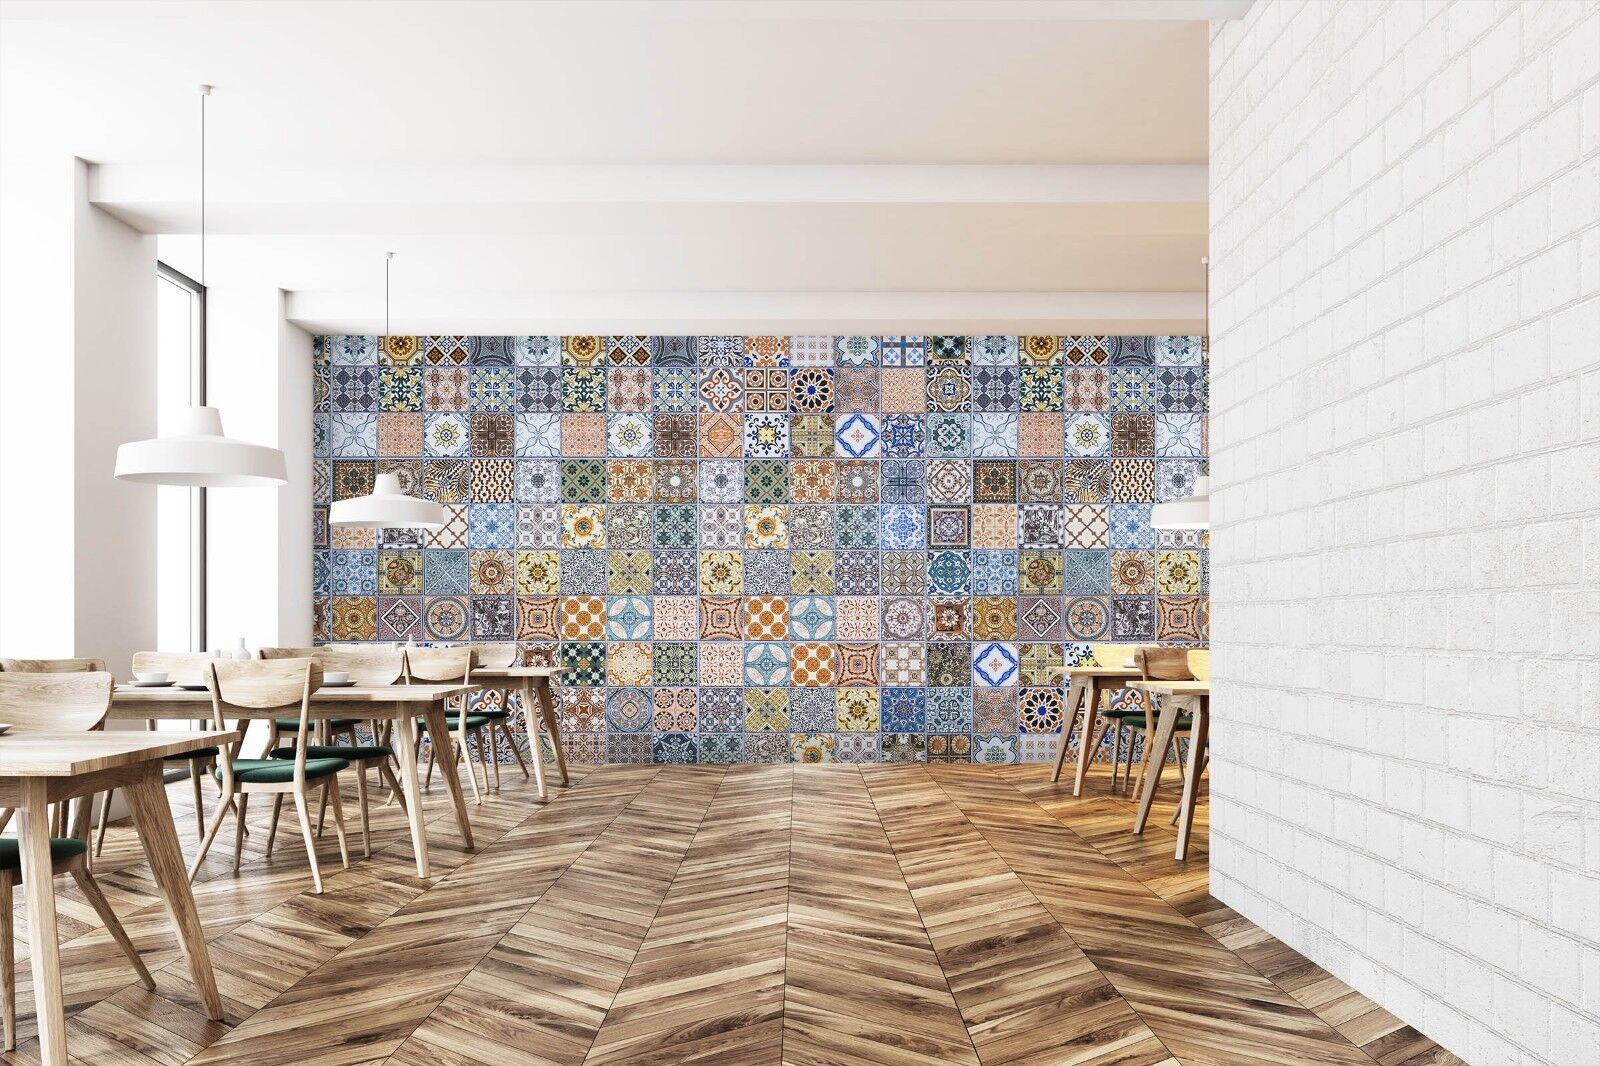 3D Flower Pattern 7117 Texture Tiles Marble Wall Paper Decal Wallpaper Mural AJ